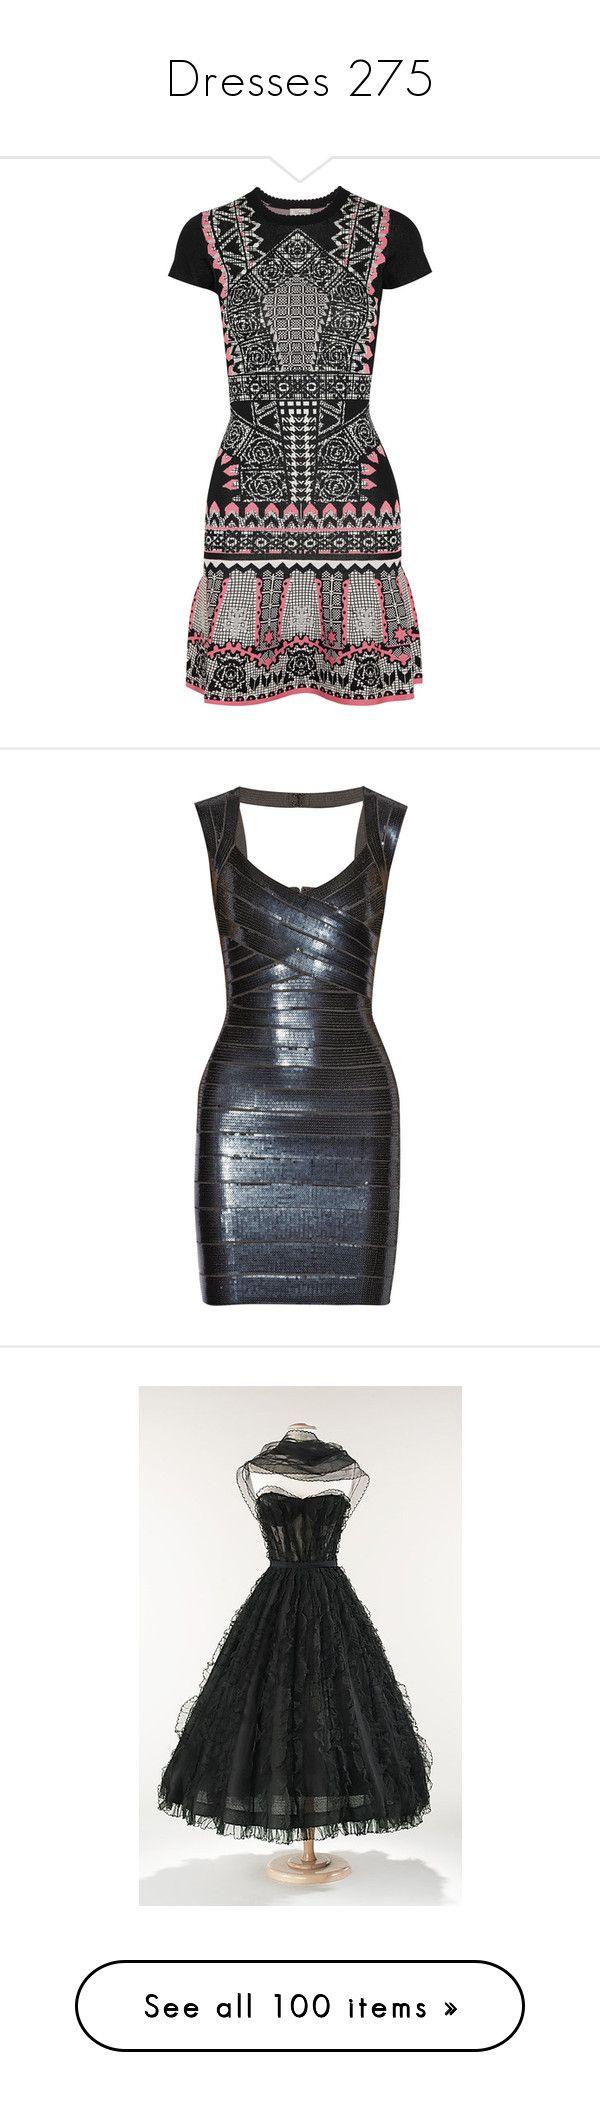 """Dresses 275"" by singlemom ❤ liked on Polyvore featuring dresses, floral dresses, floral jersey dress, short african dresses, short dresses, jersey dress, gunmetal, sequin dress, mini dress and mini cocktail dress"